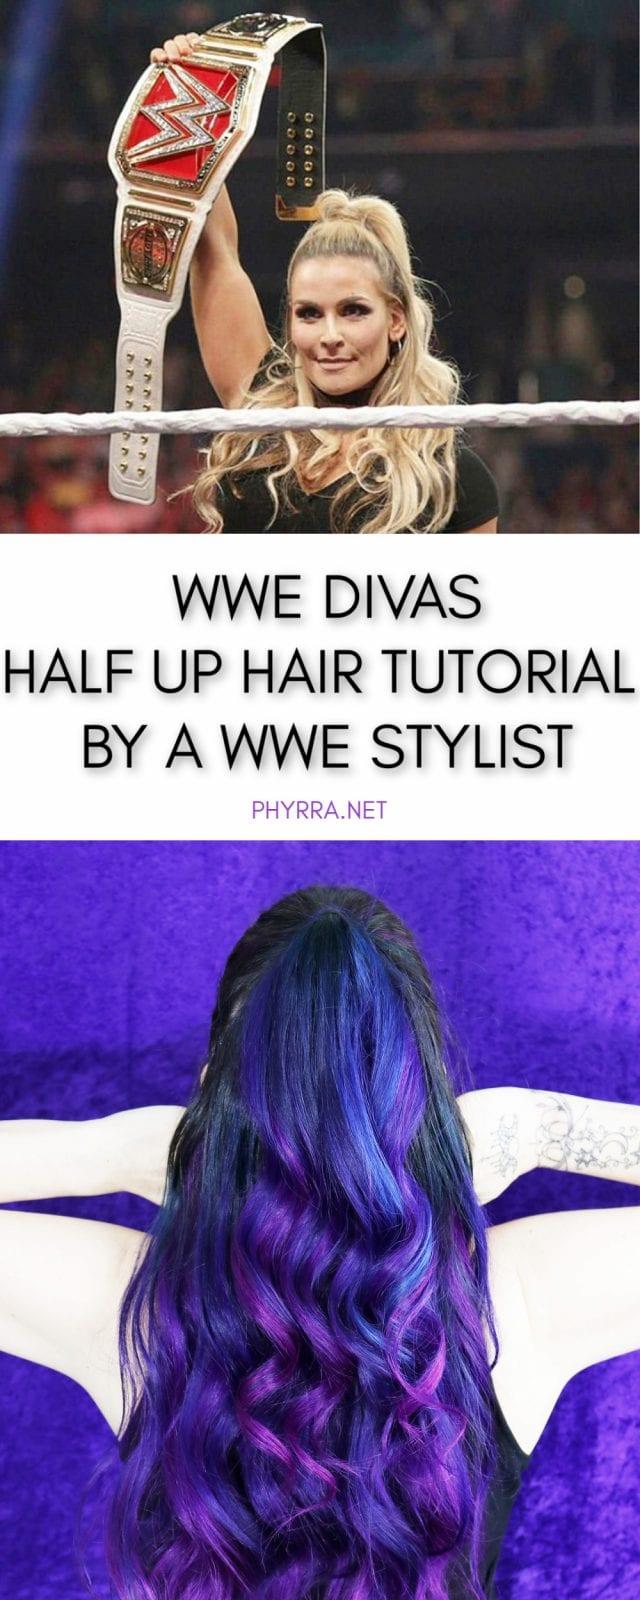 WWE Divas Half Up Half Down Hair Tutorial